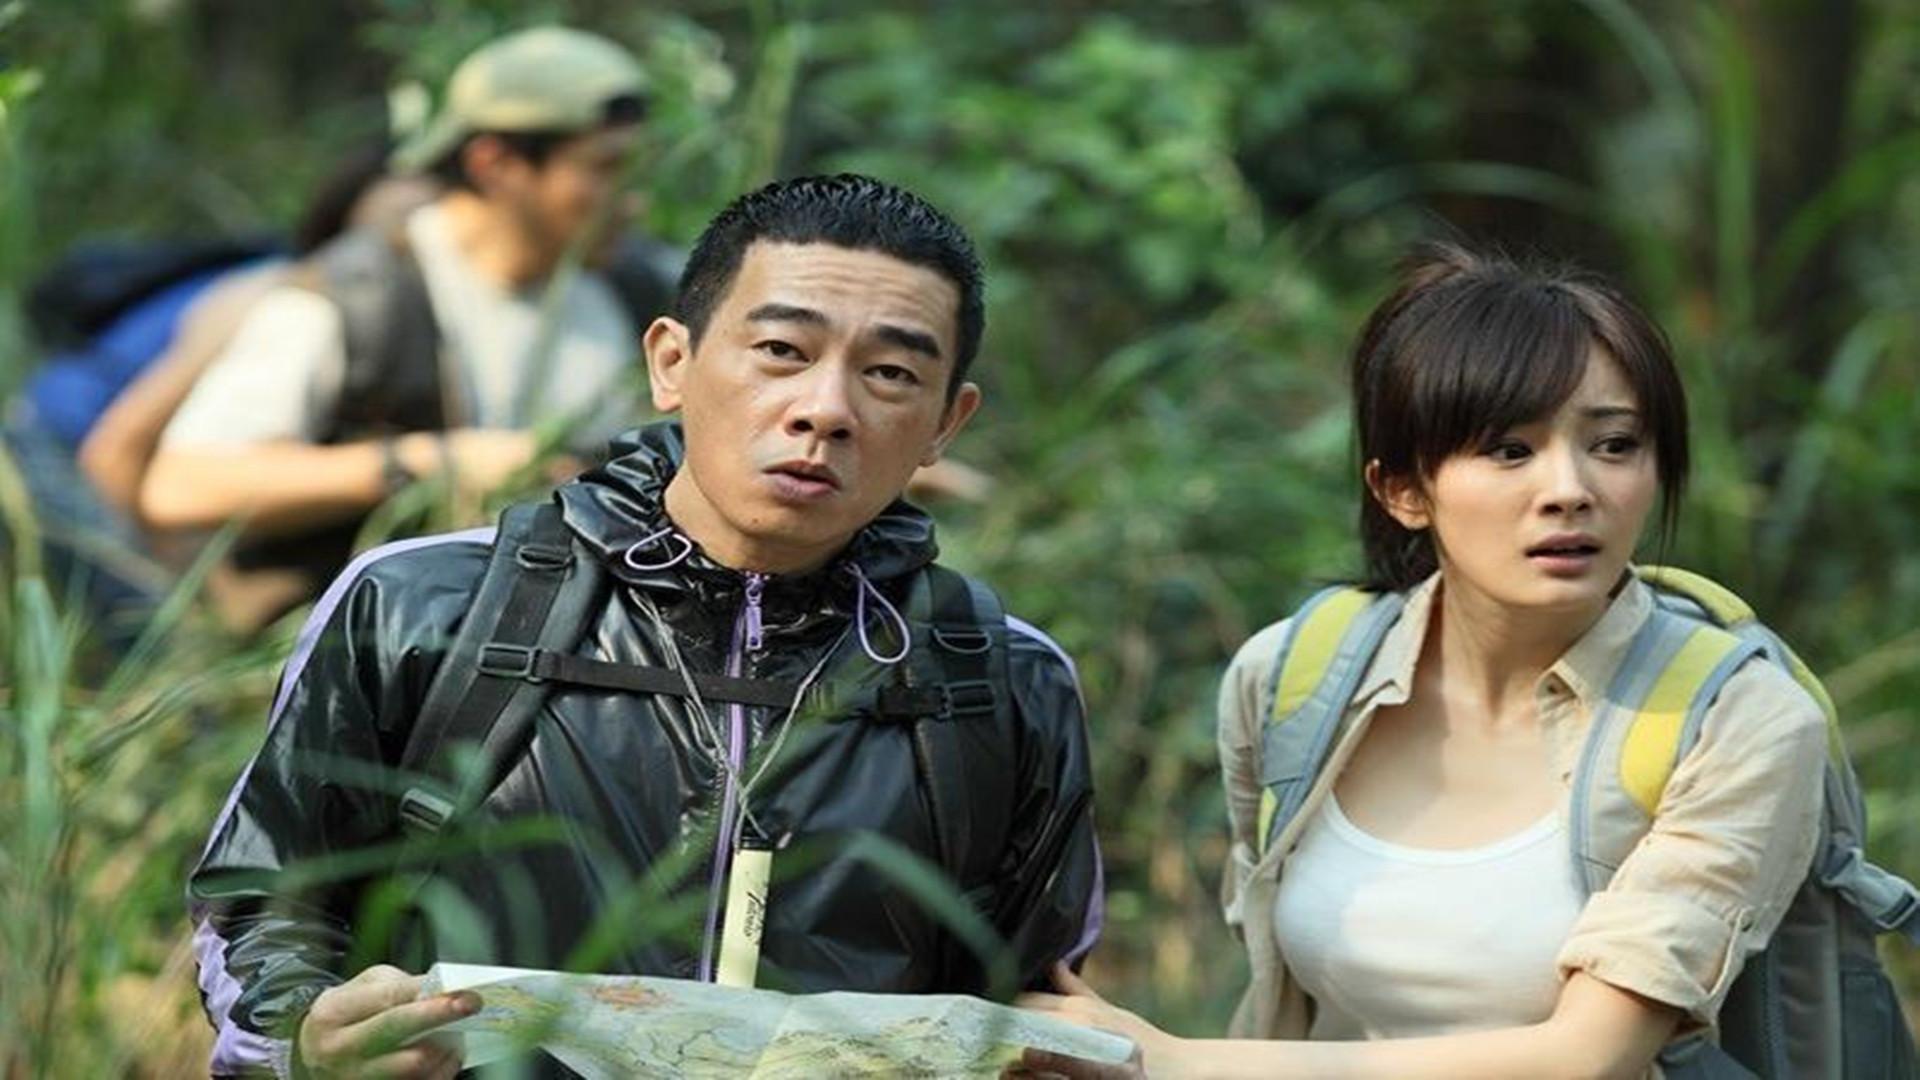 <b>盘点杨幂的六部电影,最后一部与李易峰上演超甜爱恋</b>